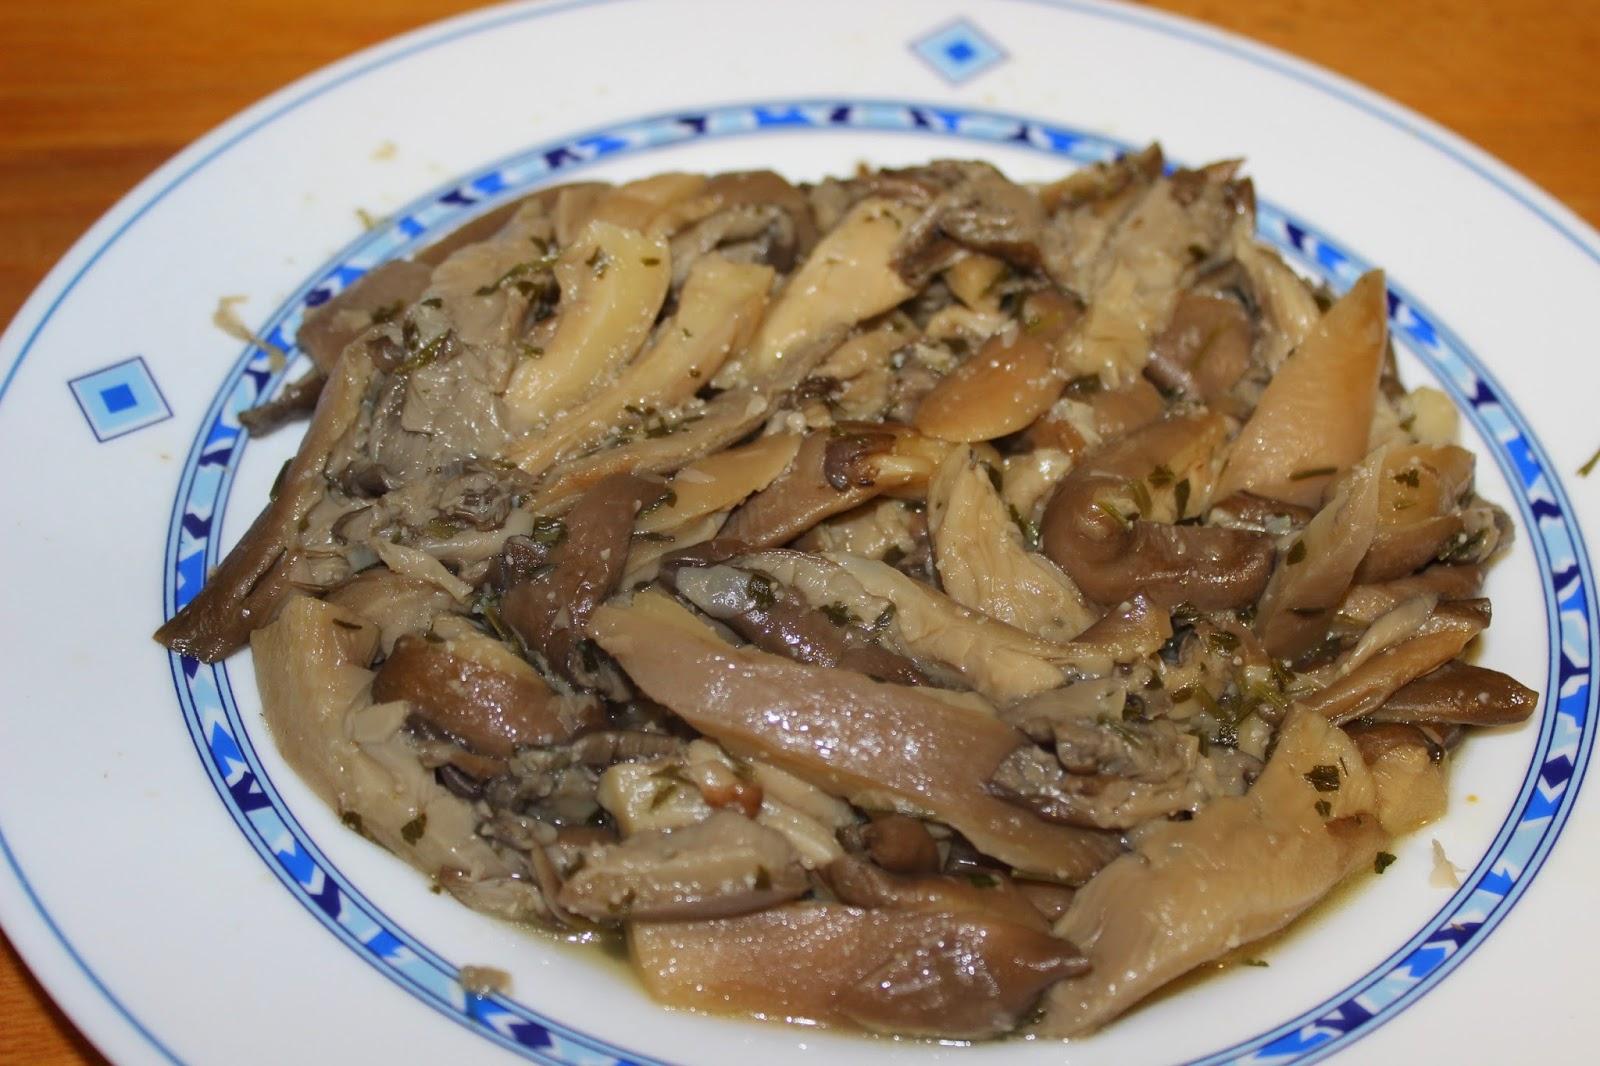 La cocina de gibello setas girgola al ajillo - Setas cultivadas al ajillo ...